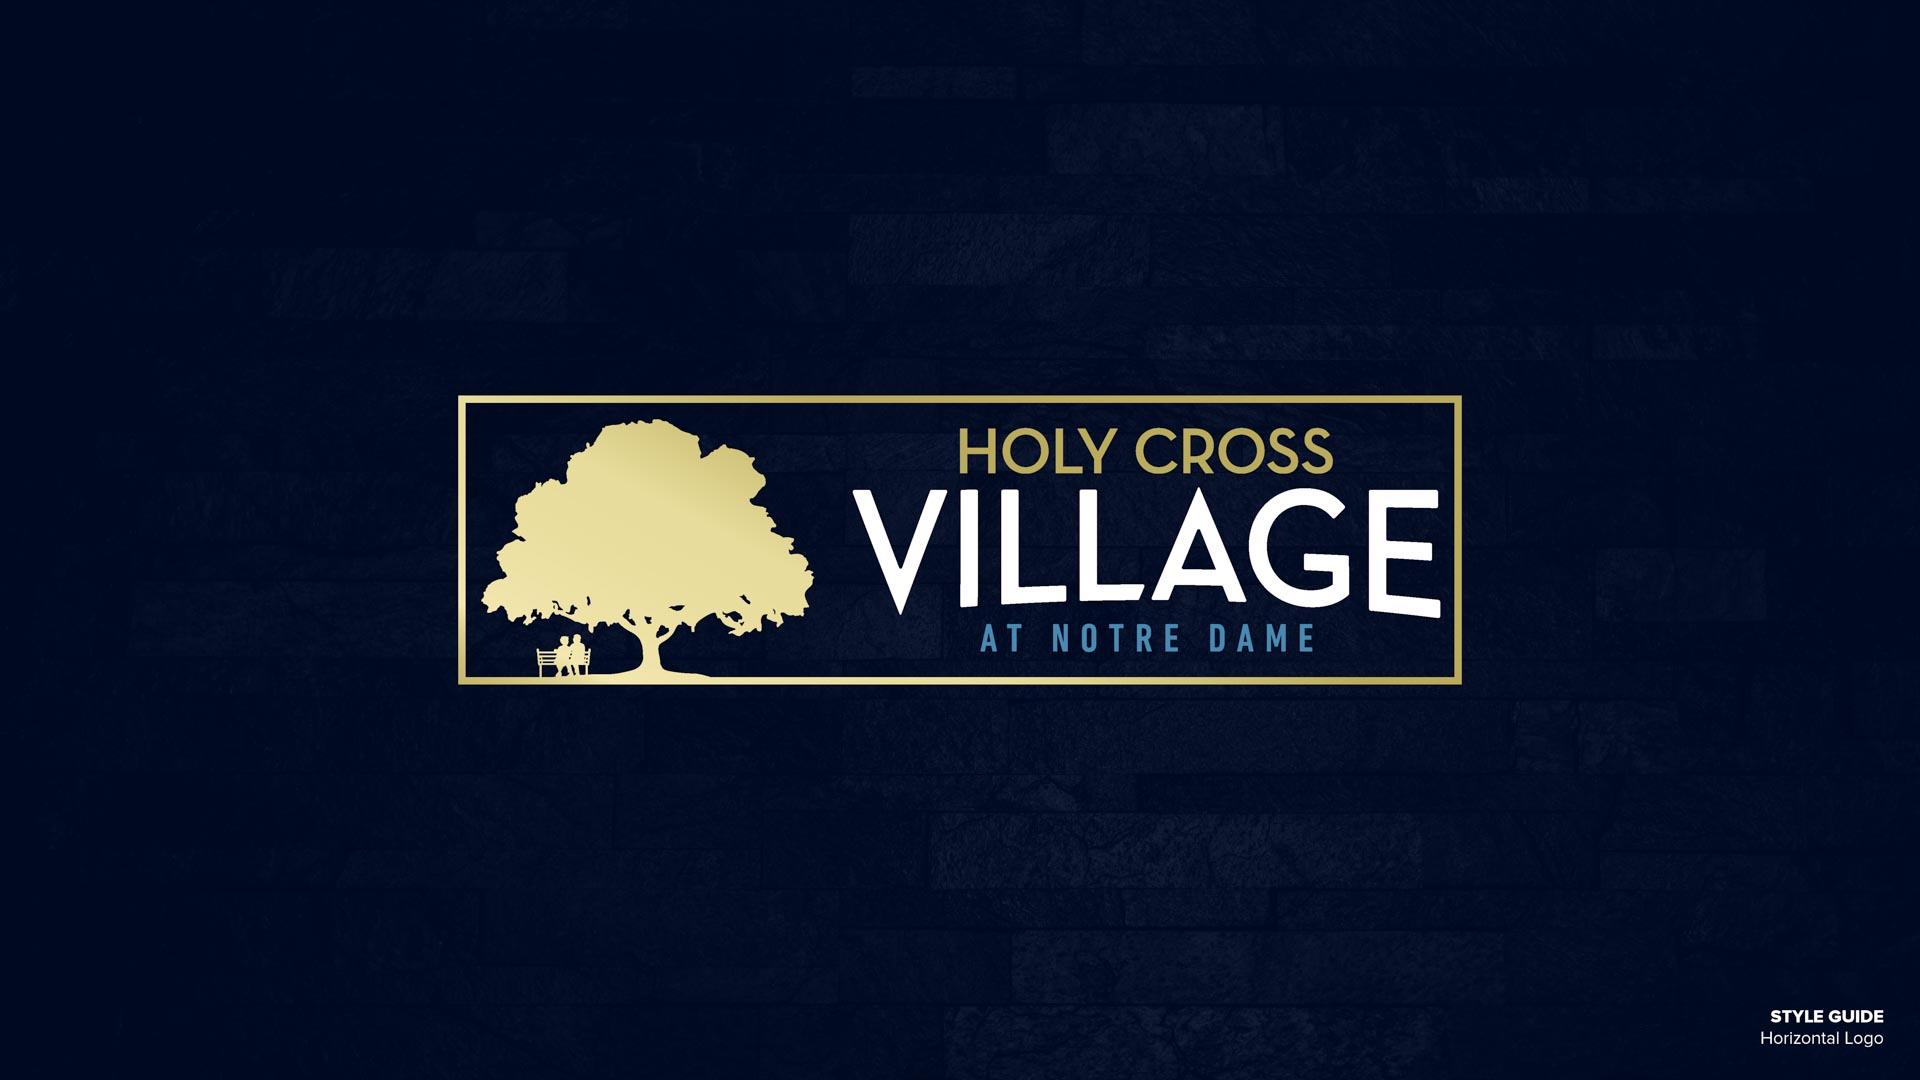 Holy Cross Village's Horizontal Logo (Unofficial)